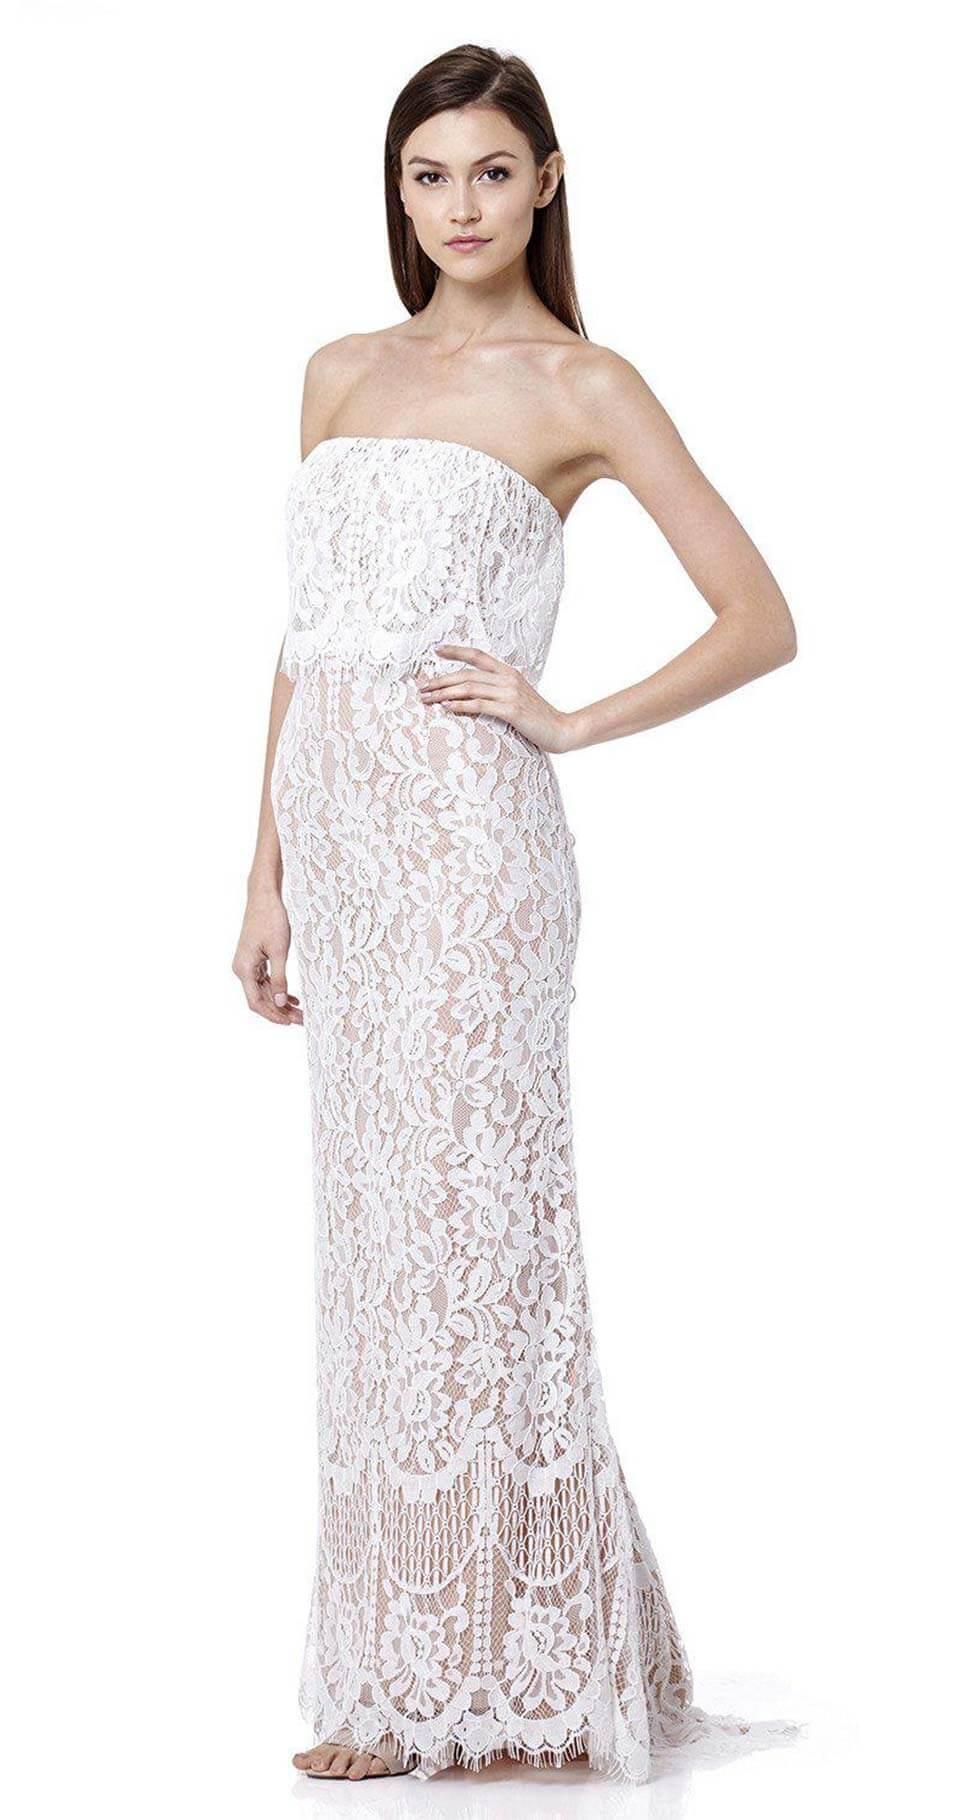 Vestido branco longo de renda